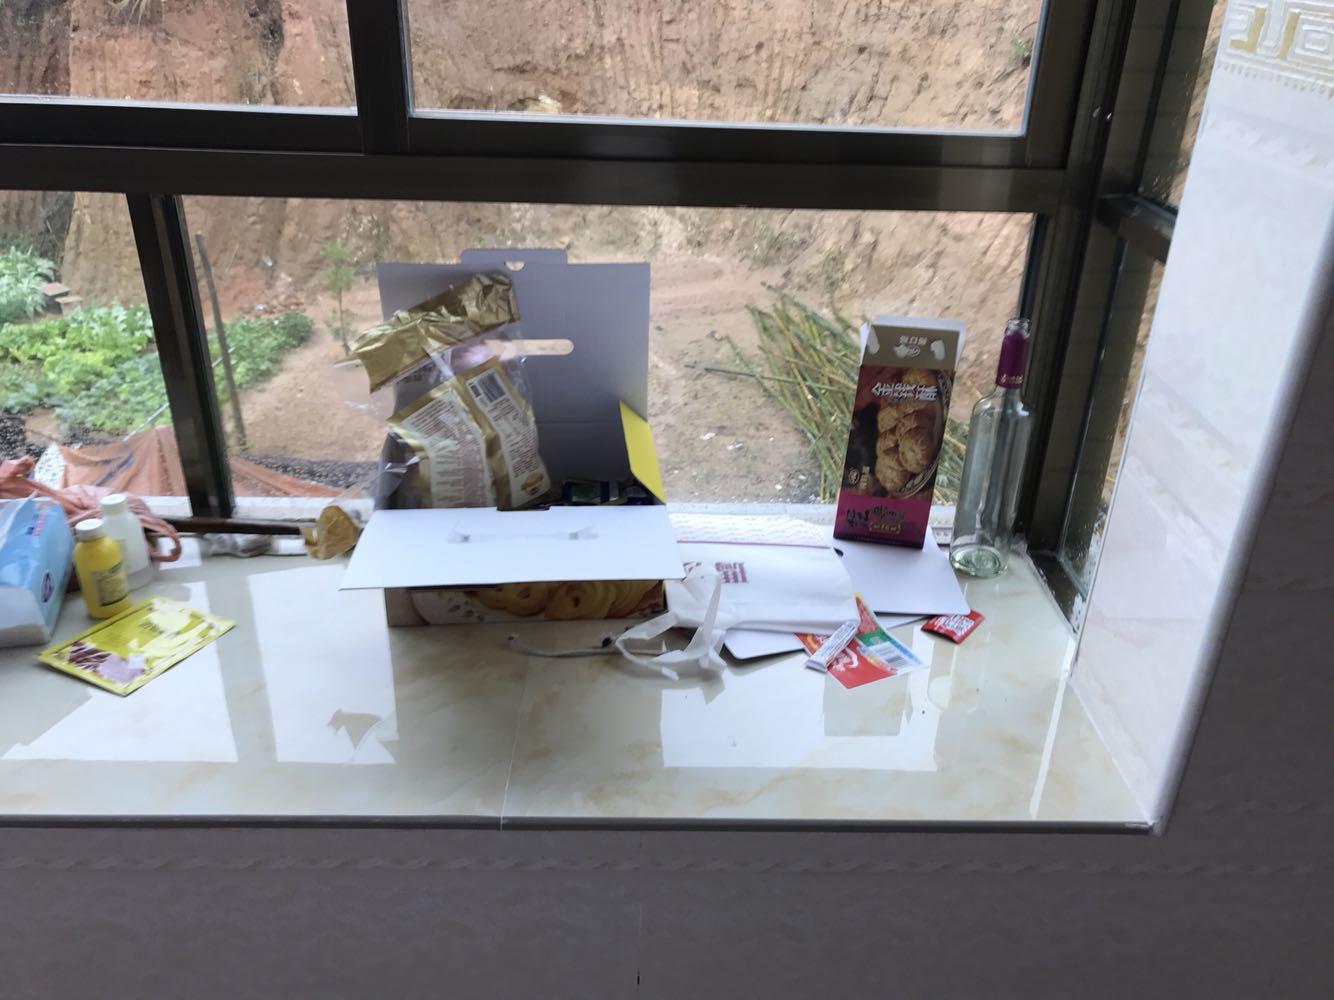 bloomingdales mens store wallet 0026534 replica